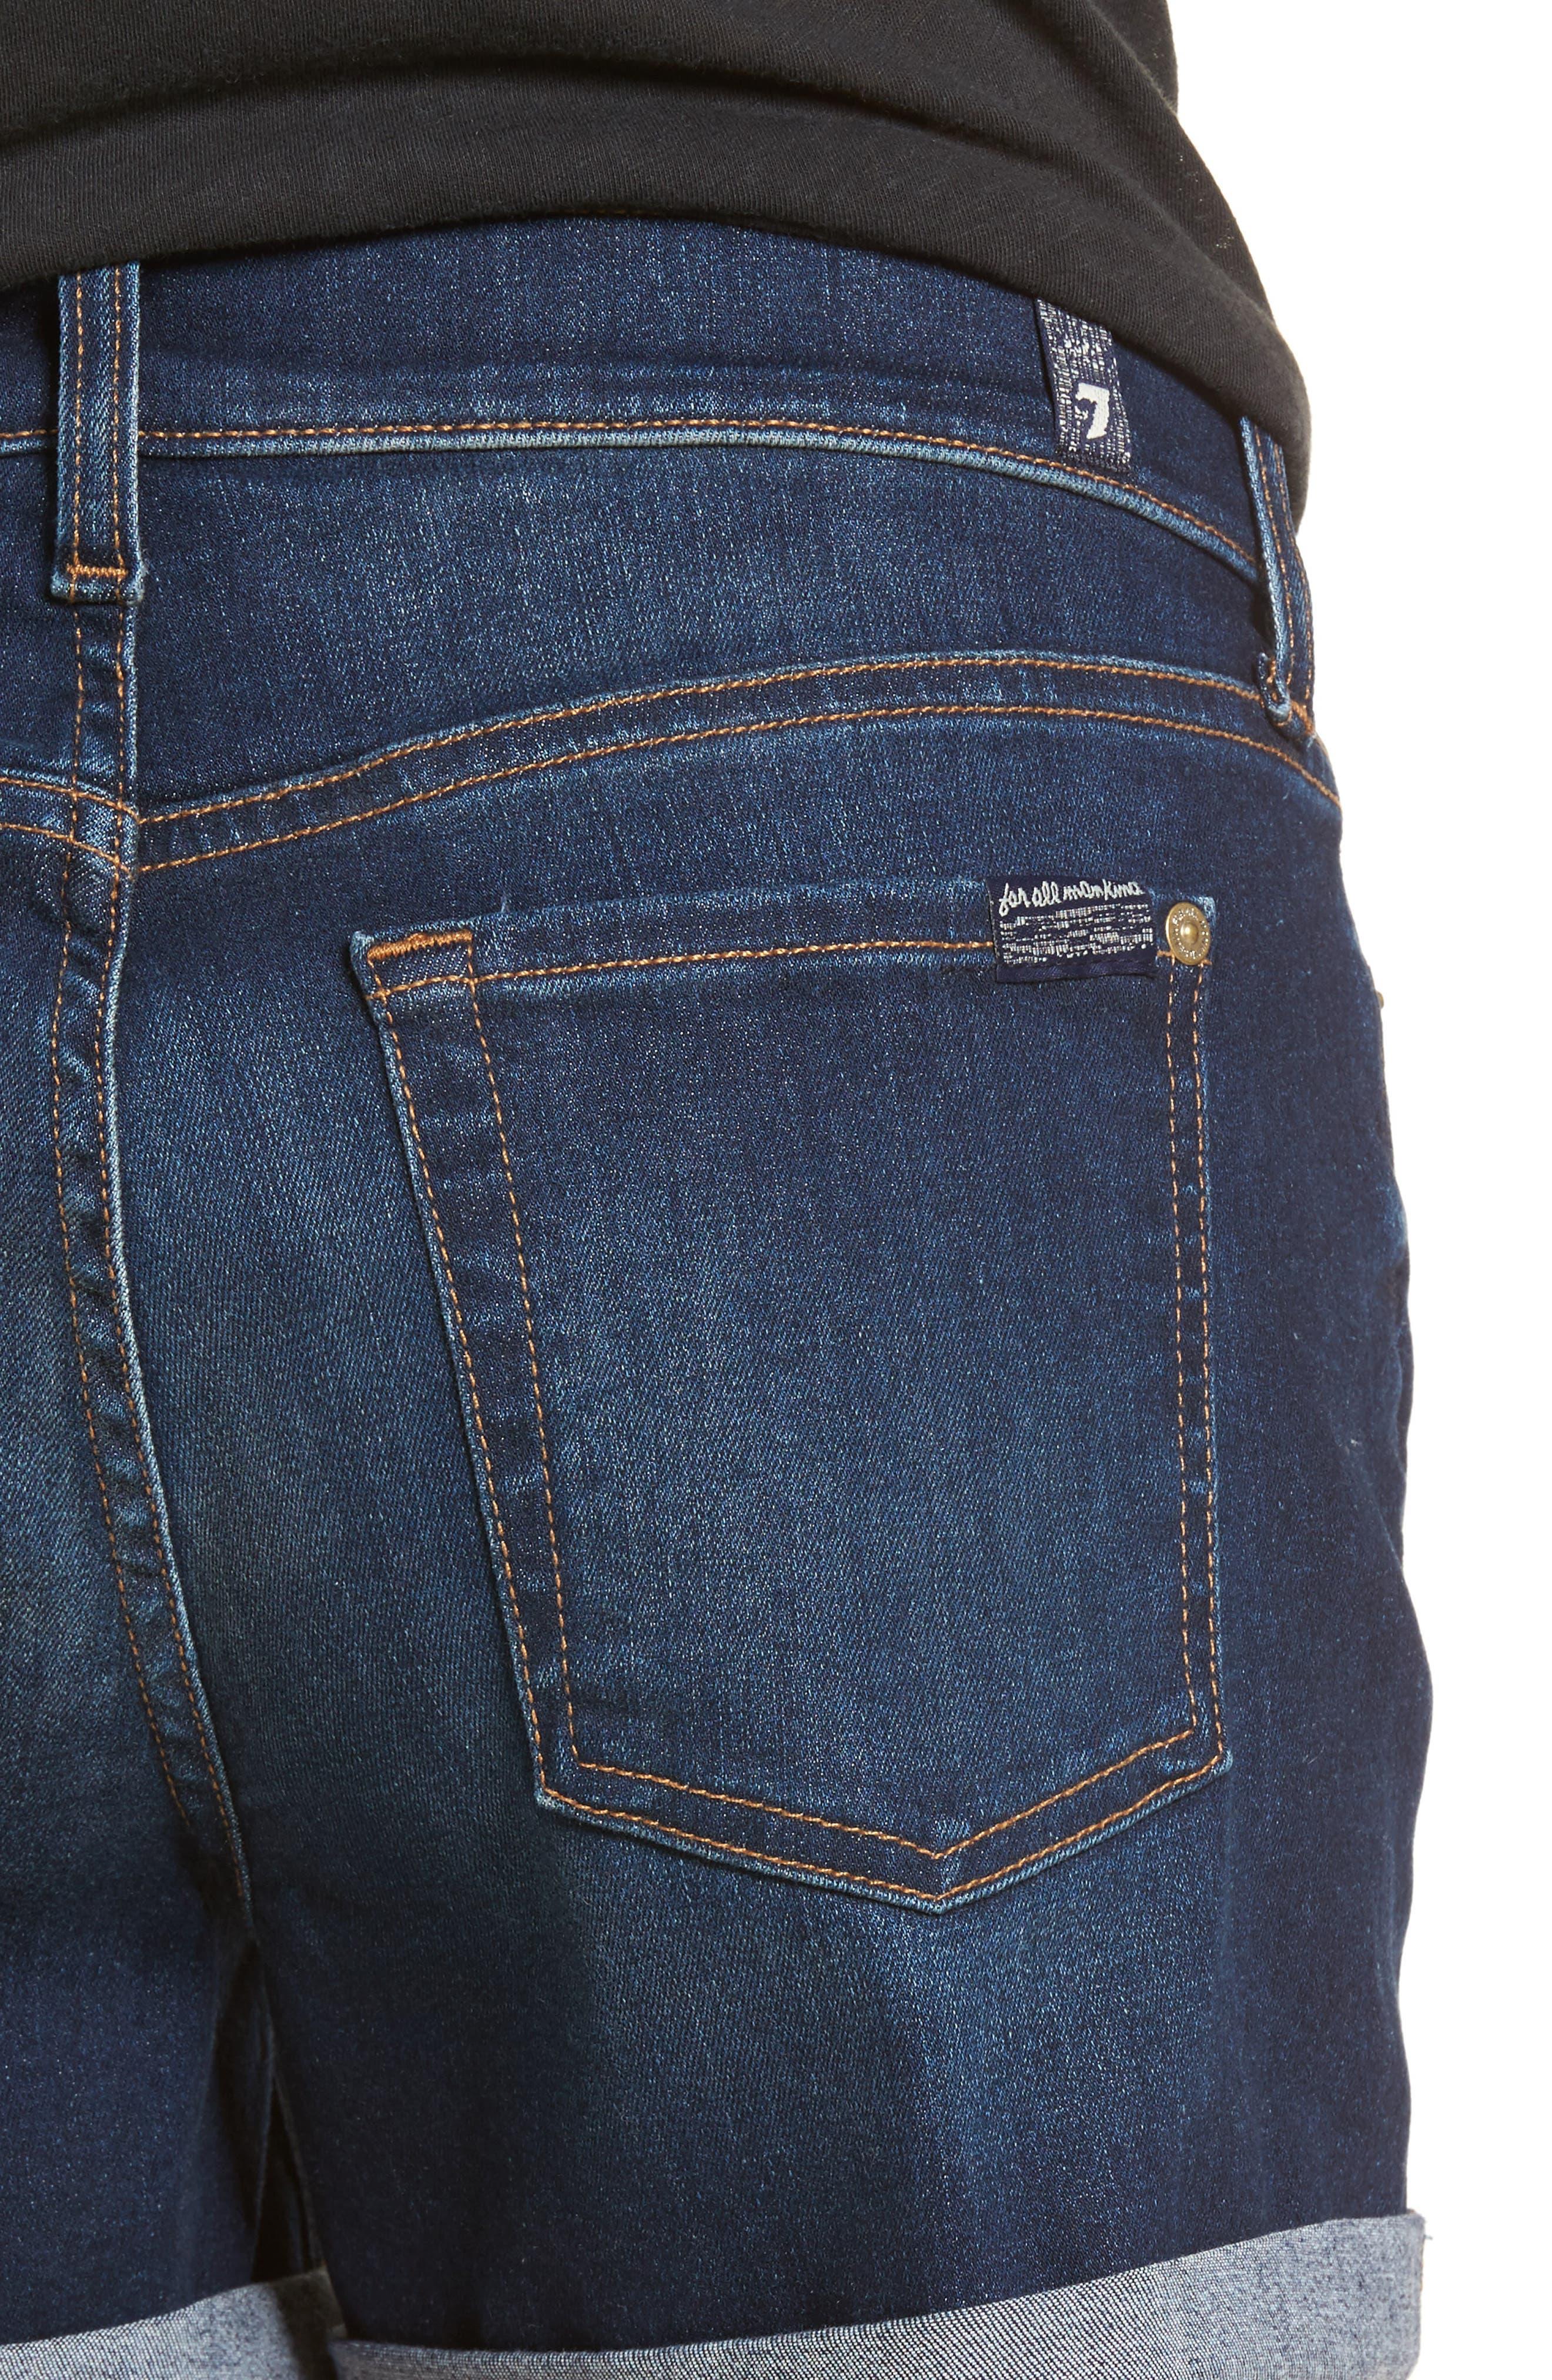 b(air) Cuffed Denim Shorts,                             Alternate thumbnail 4, color,                             MORENO